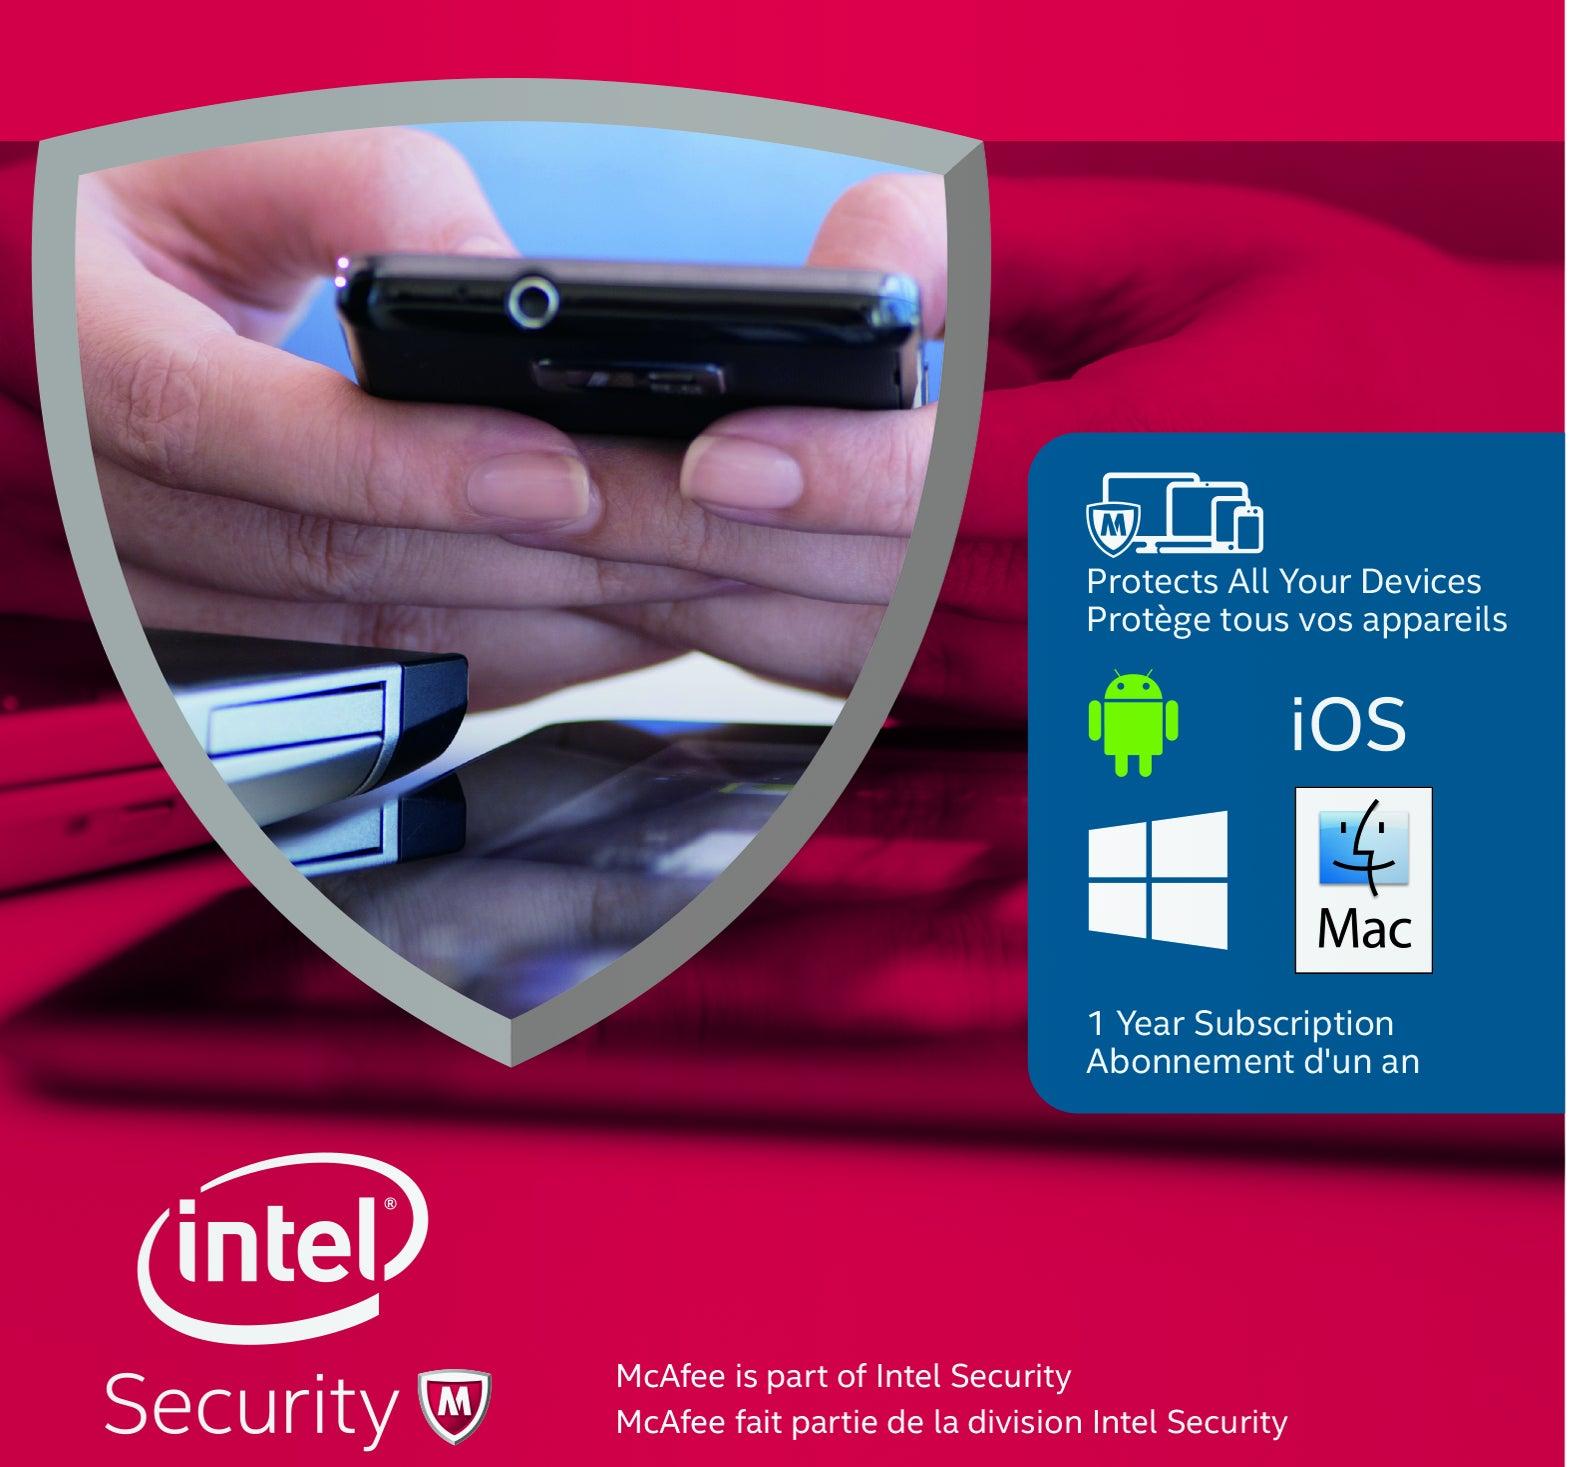 mcafee antivirus free download full version with crack 2013